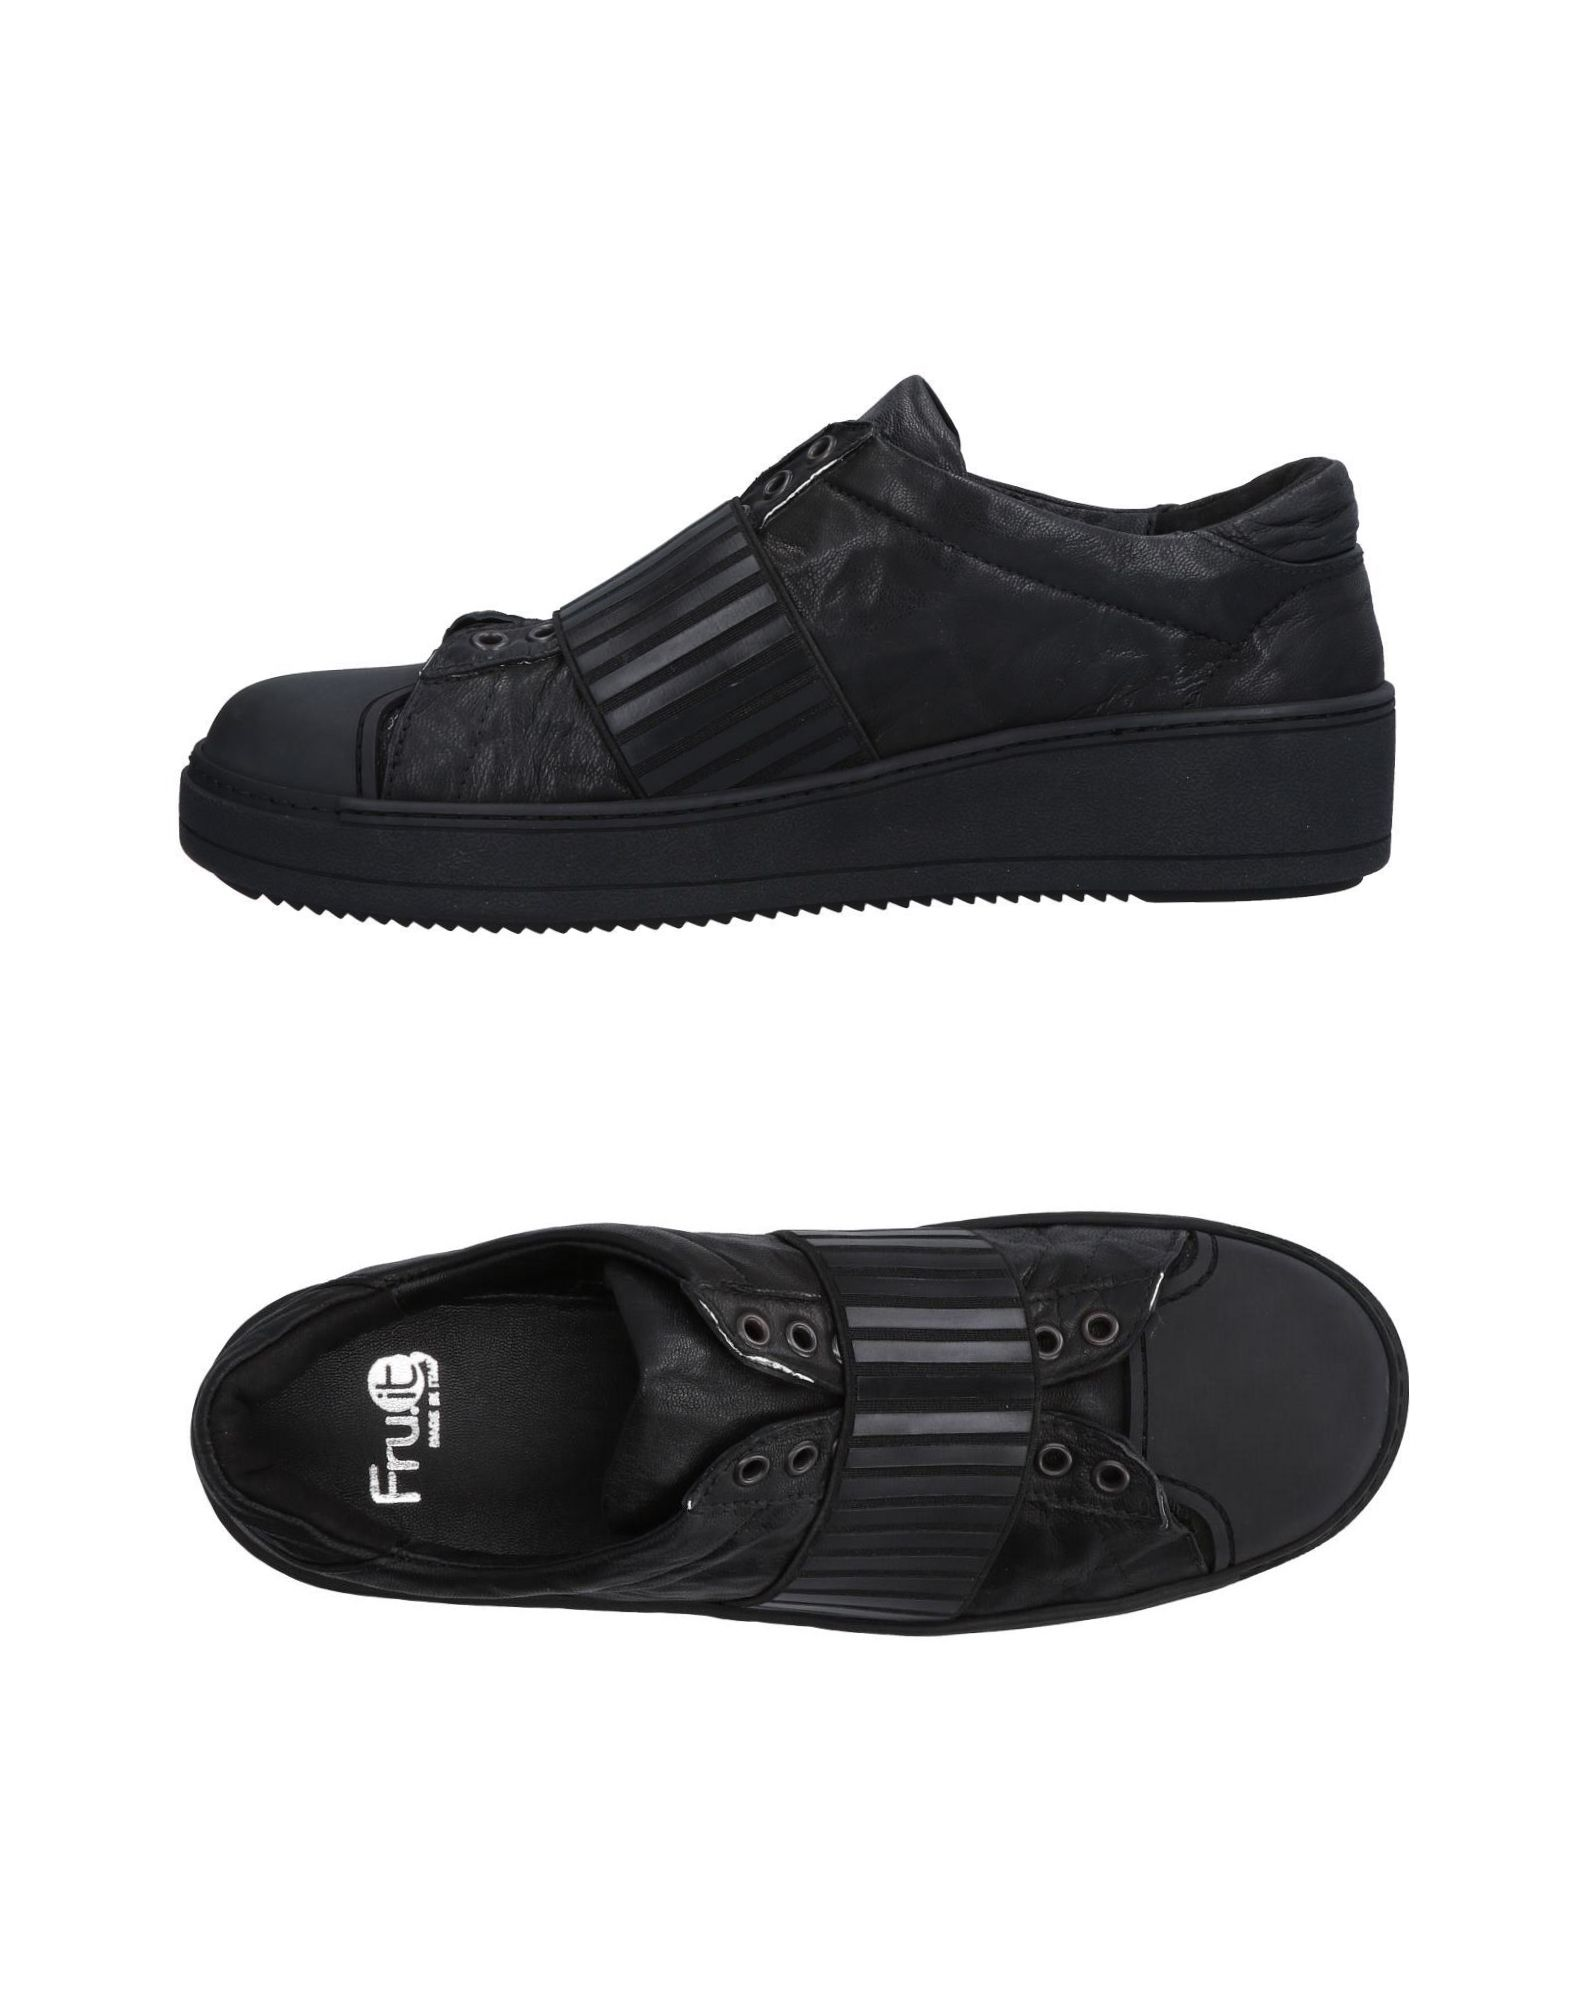 Fru.It Sneakers Damen  11496938LX Gute Qualität beliebte Schuhe